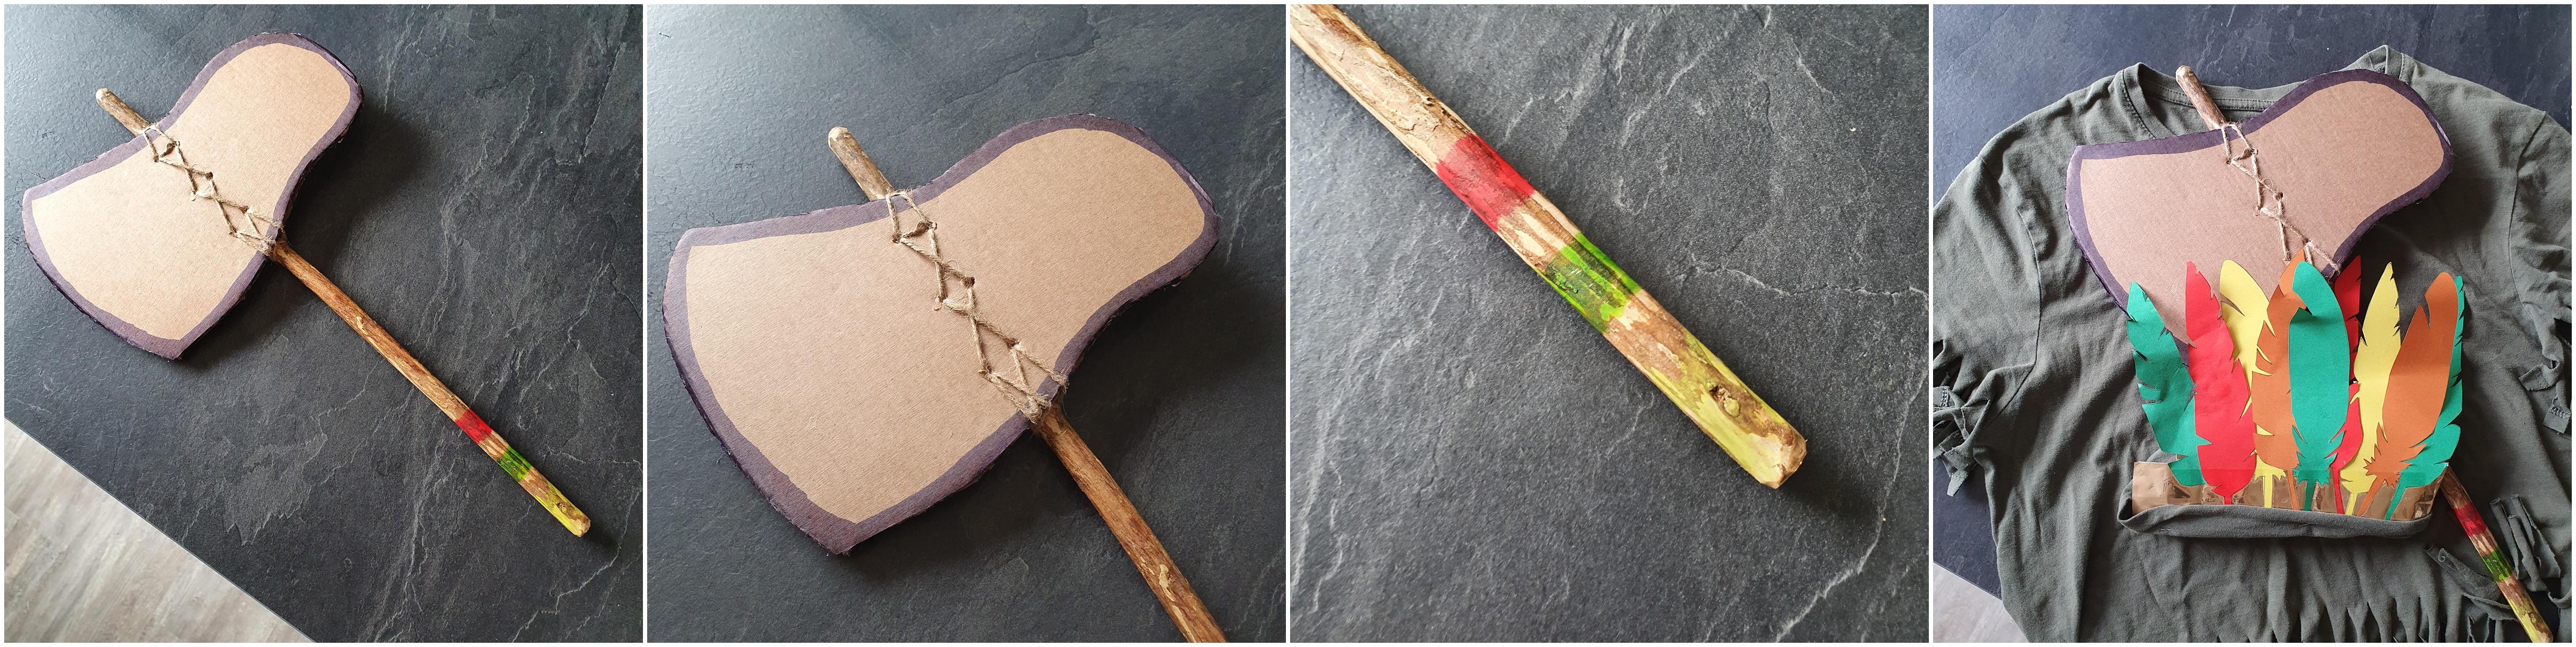 DIY déguisement indien mardi gras - www.makemyutopia.com